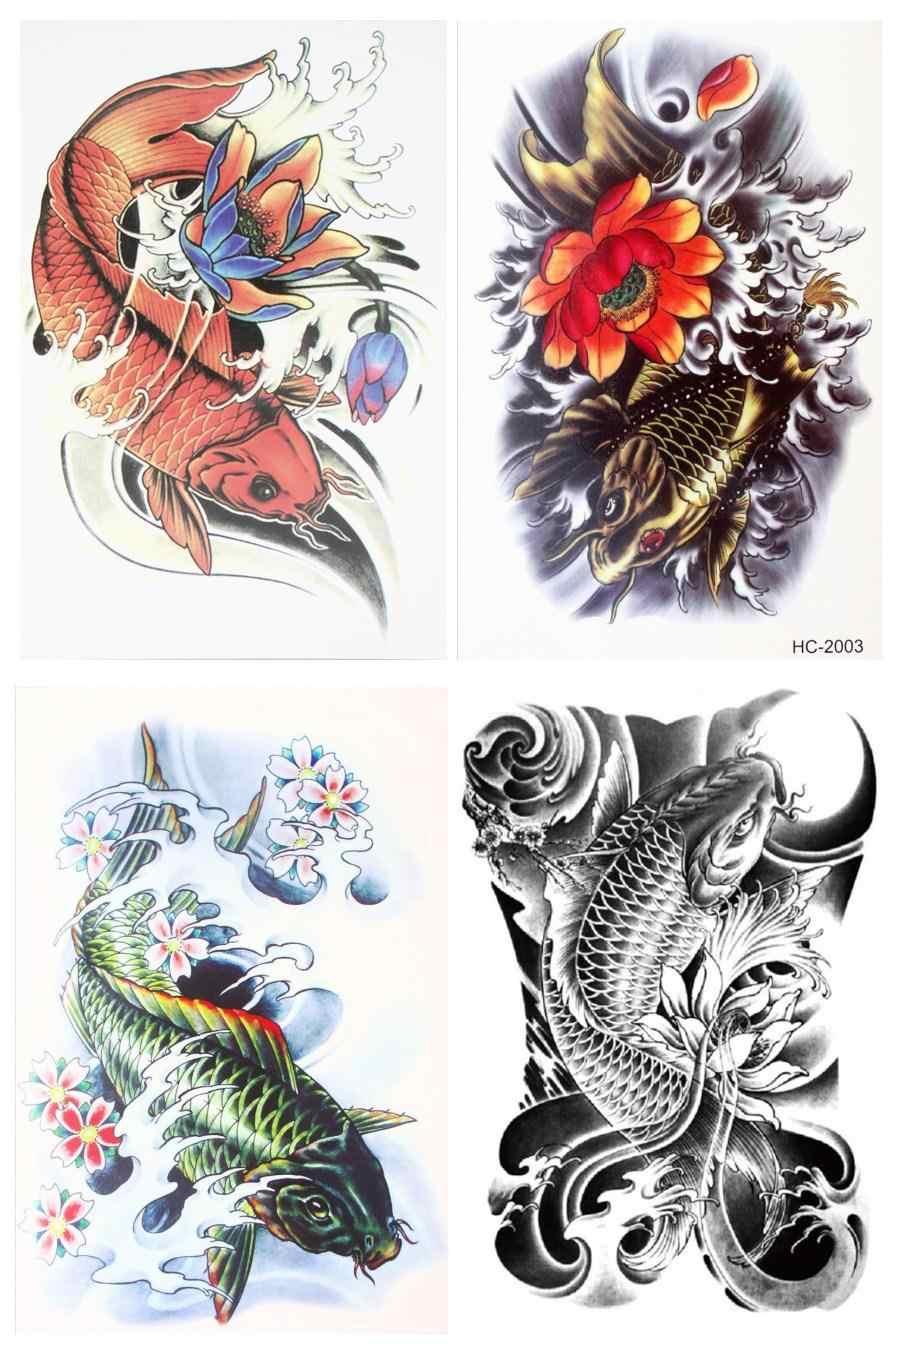 cad755894 4 pcs/set Waterproof Temporary Japanese Carp Body Art Beauty Makeup Tattoo  Stickers